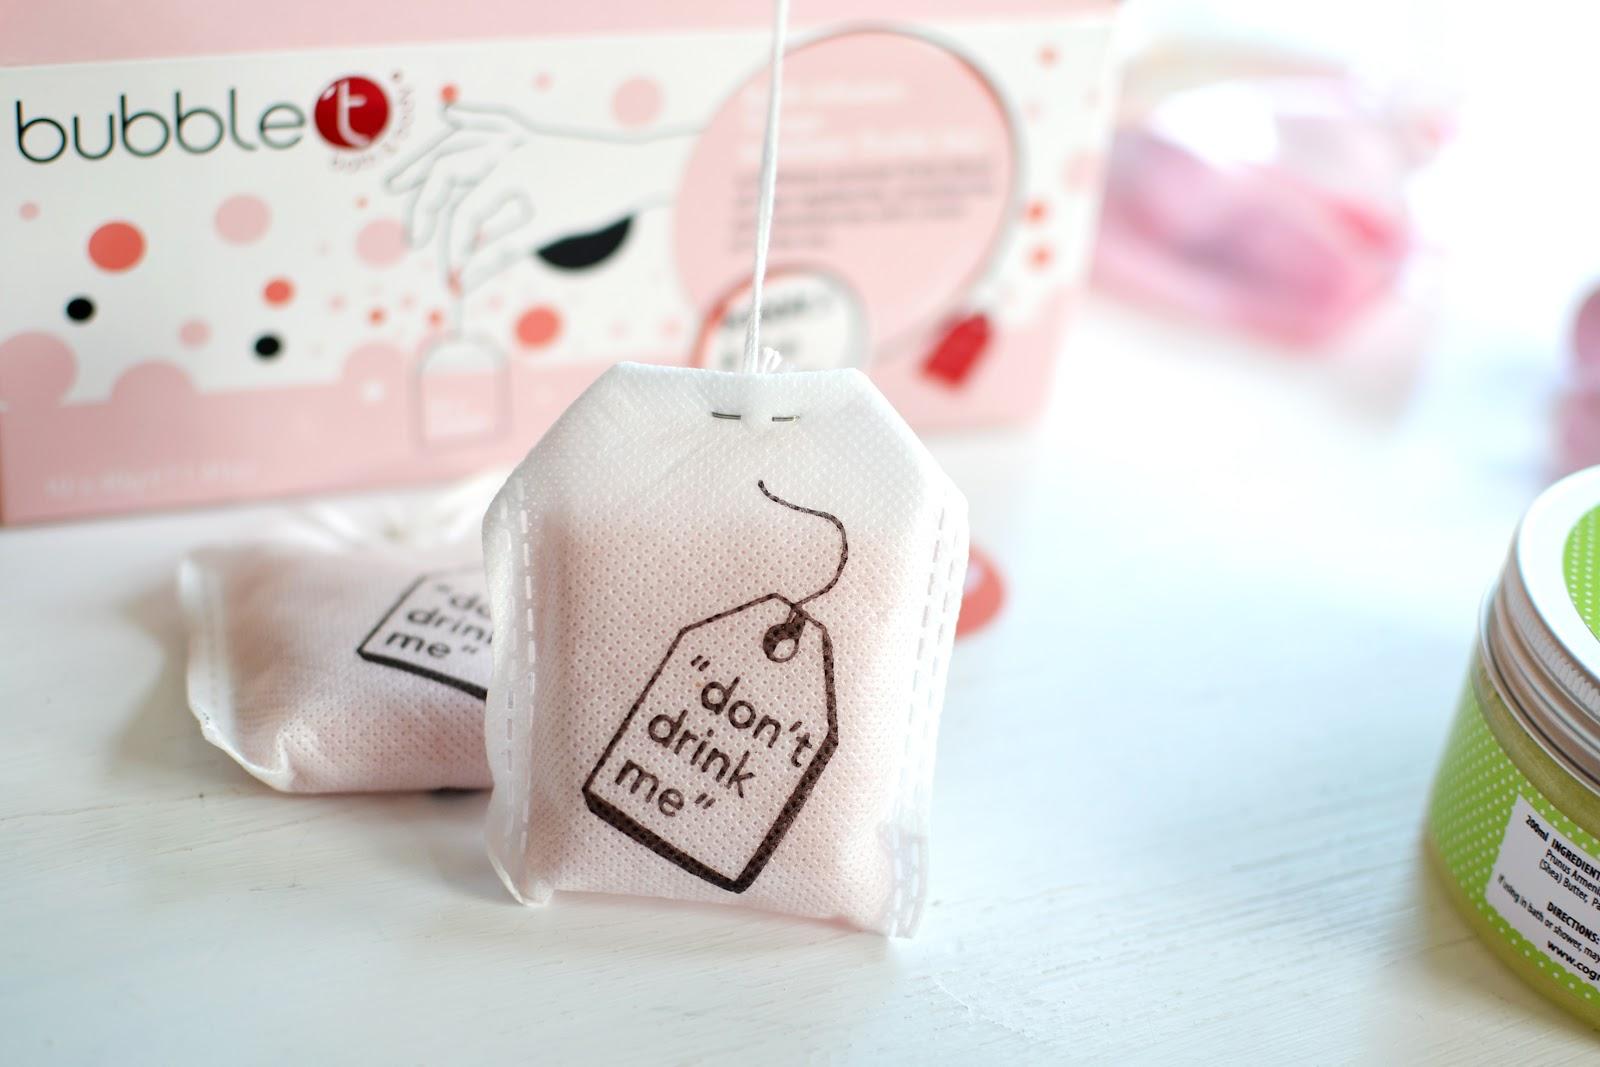 bubble t cosmetics bath tea bags